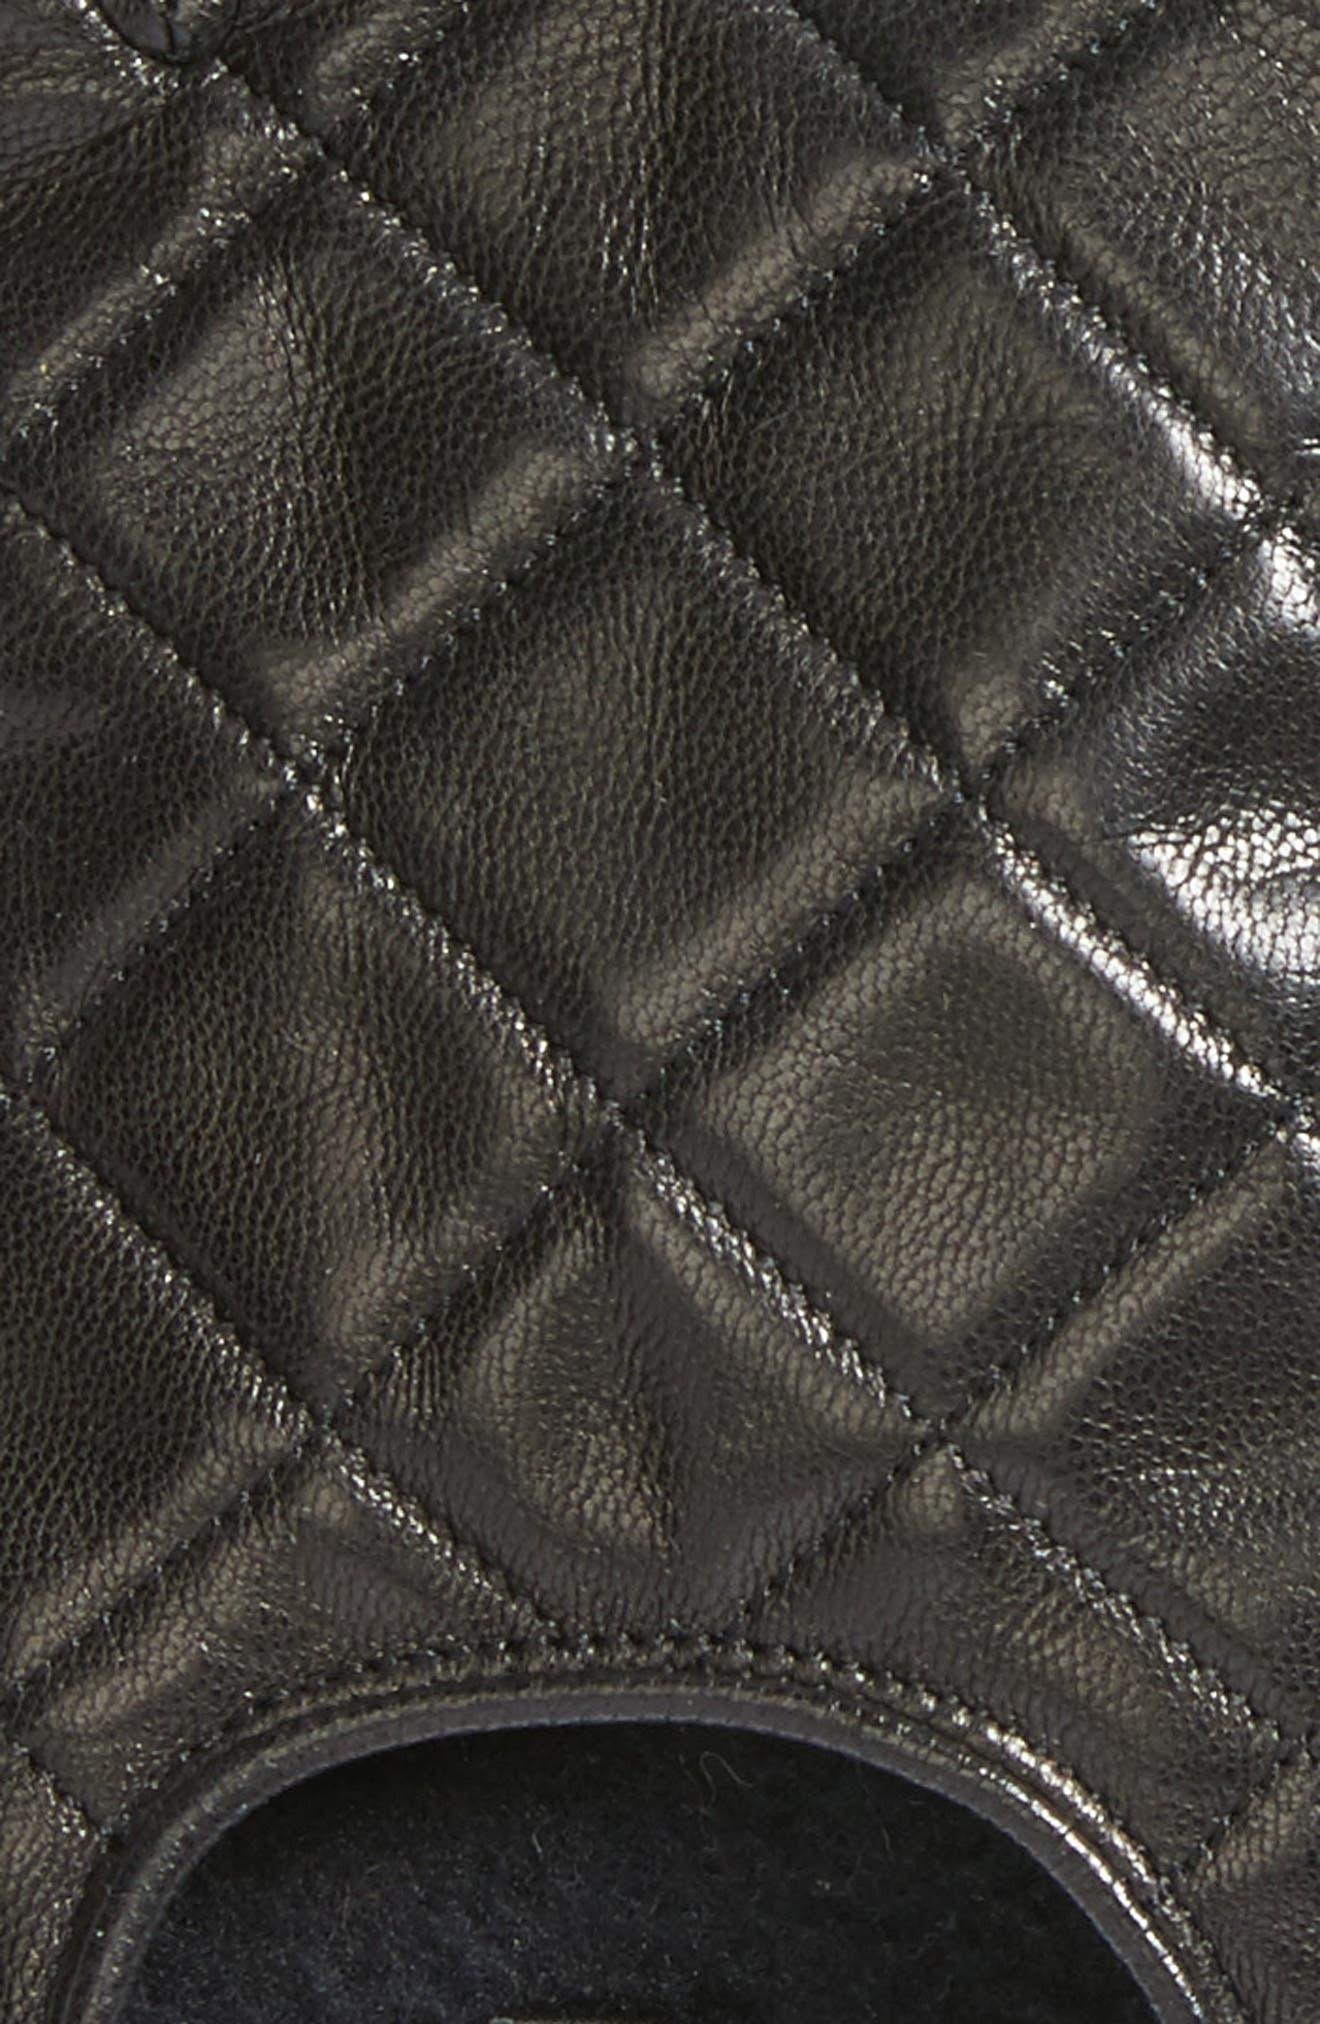 REBECCA MINKOFF,                             Quilted Goatskin Leather Fingerless Gloves,                             Alternate thumbnail 2, color,                             001